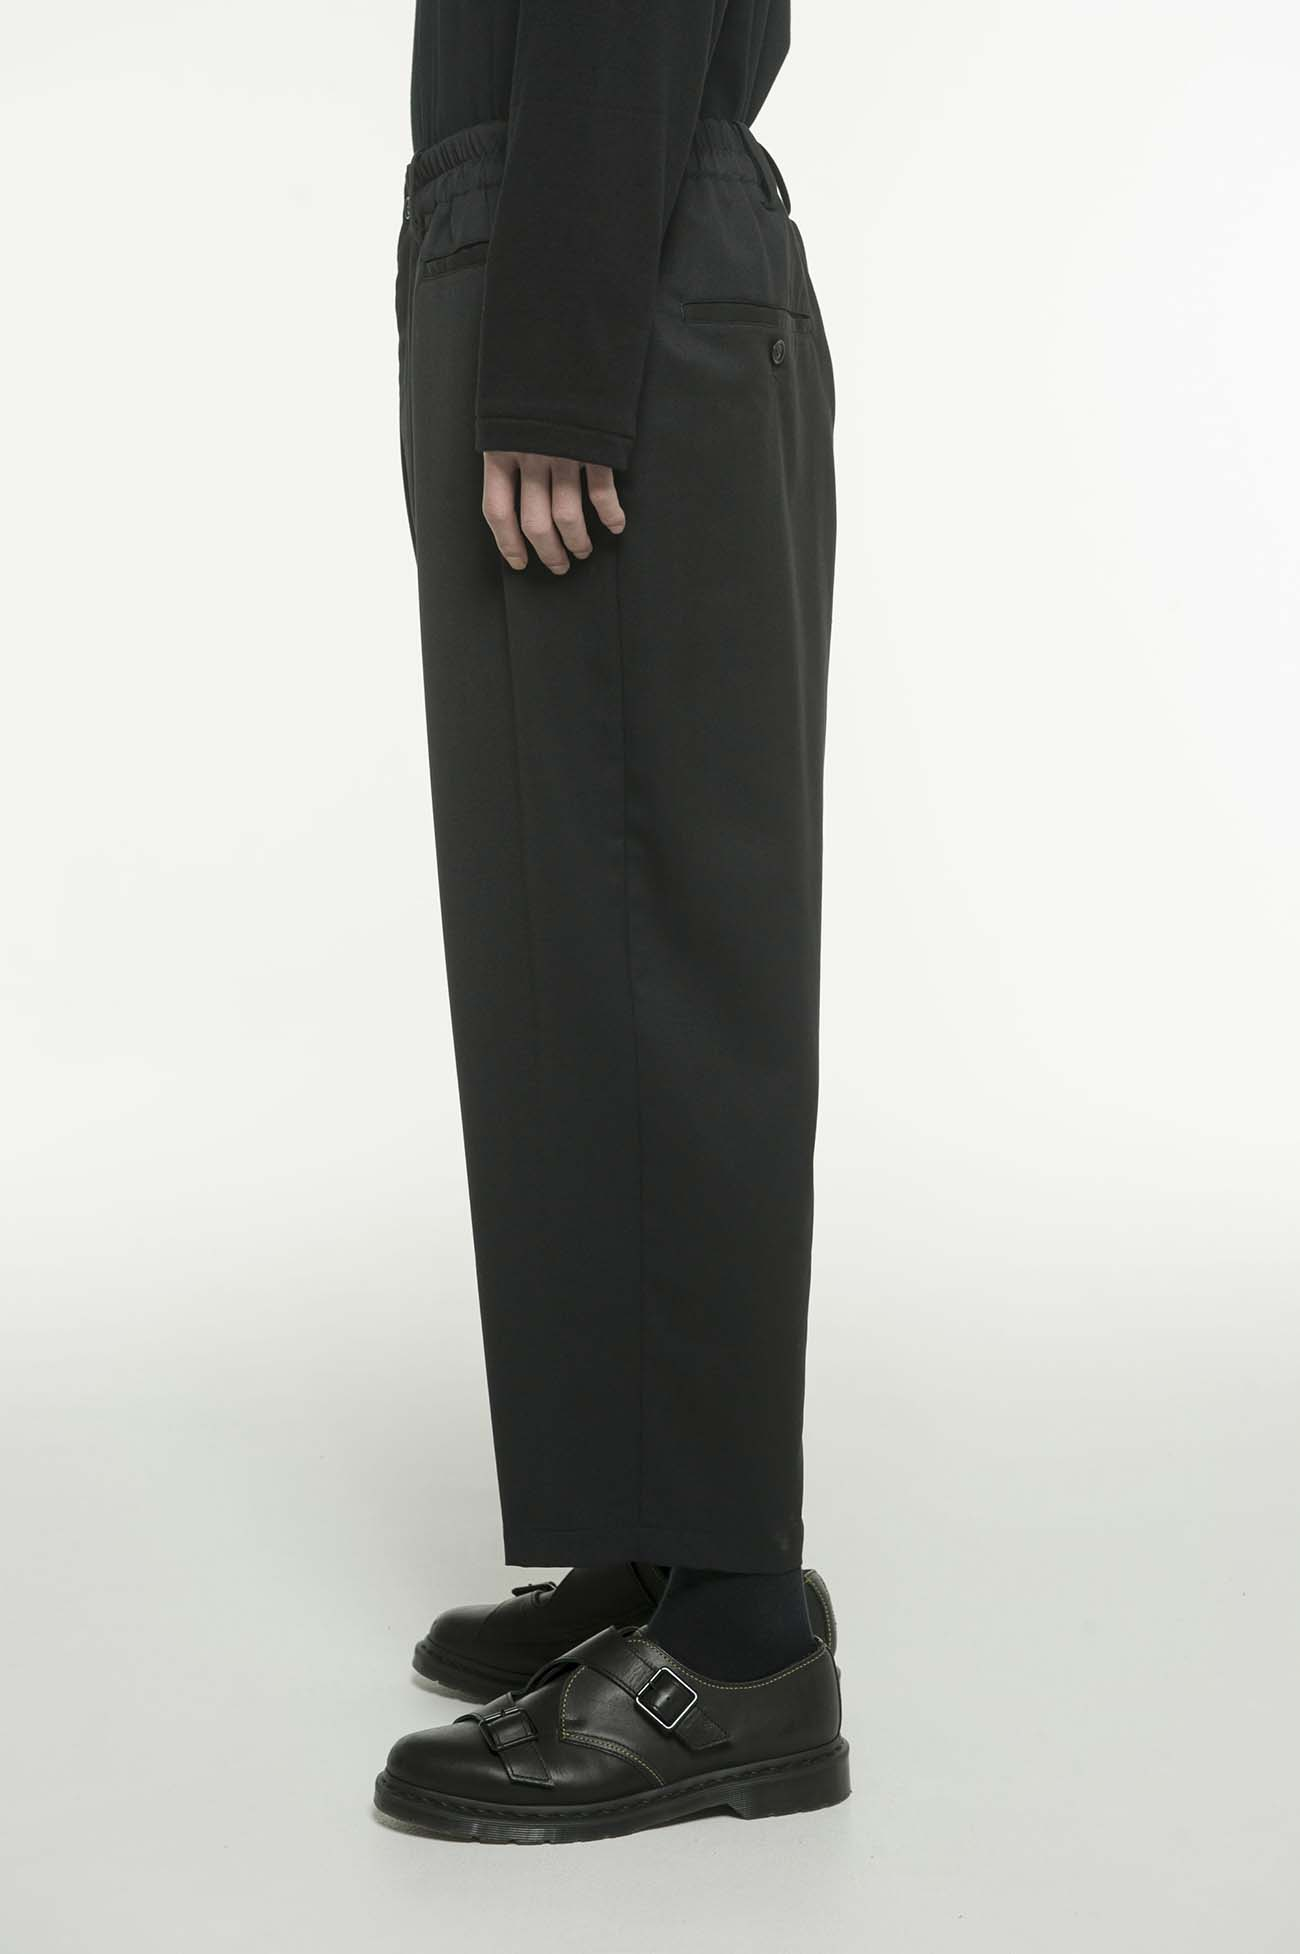 T/W Twill West Rubber Medium Tepado Pants